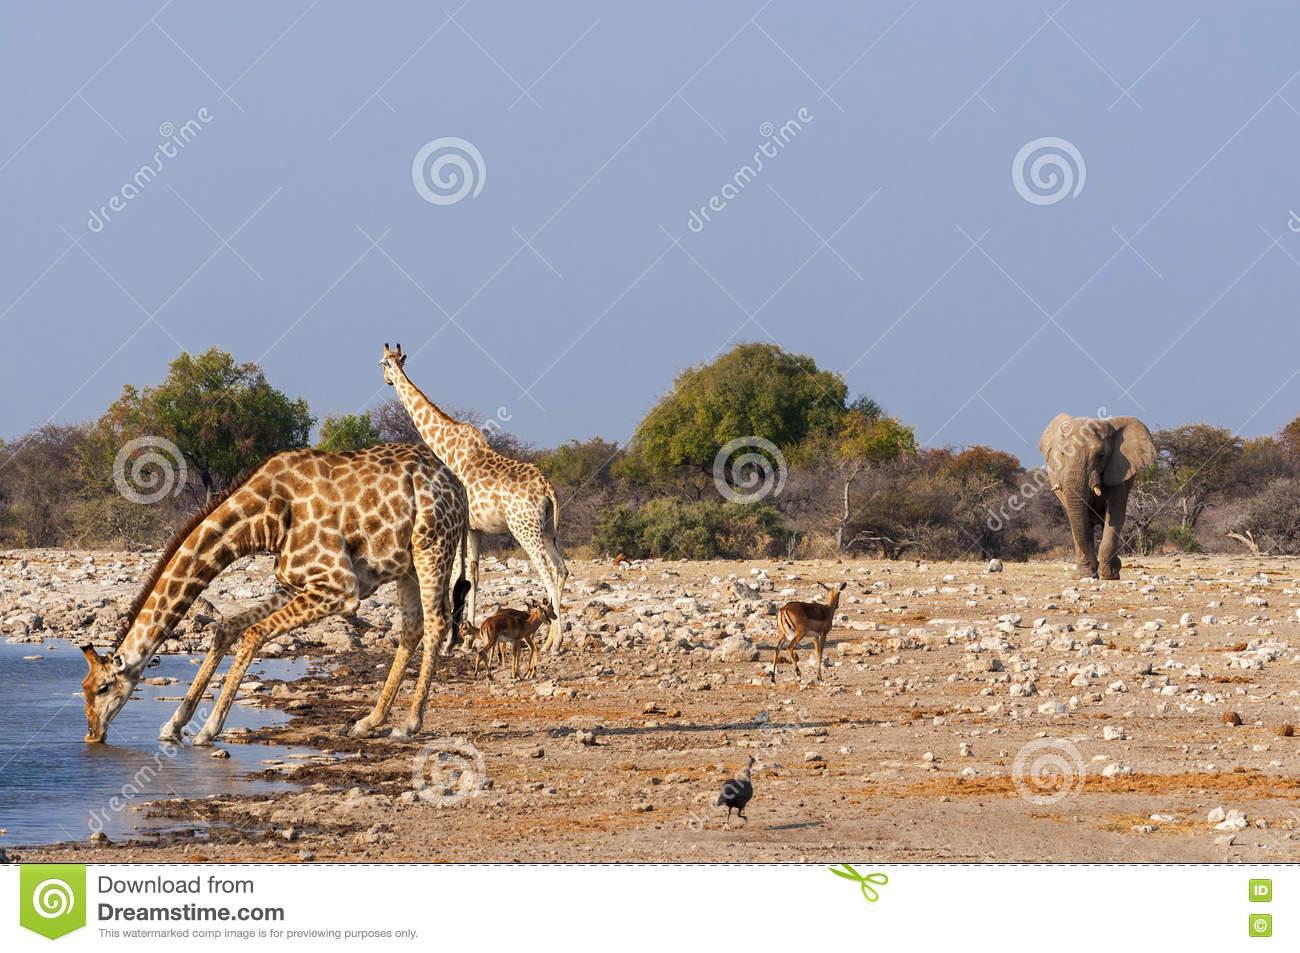 Group Of Wild Animals Near A Waterhole In The Etosha National Park.